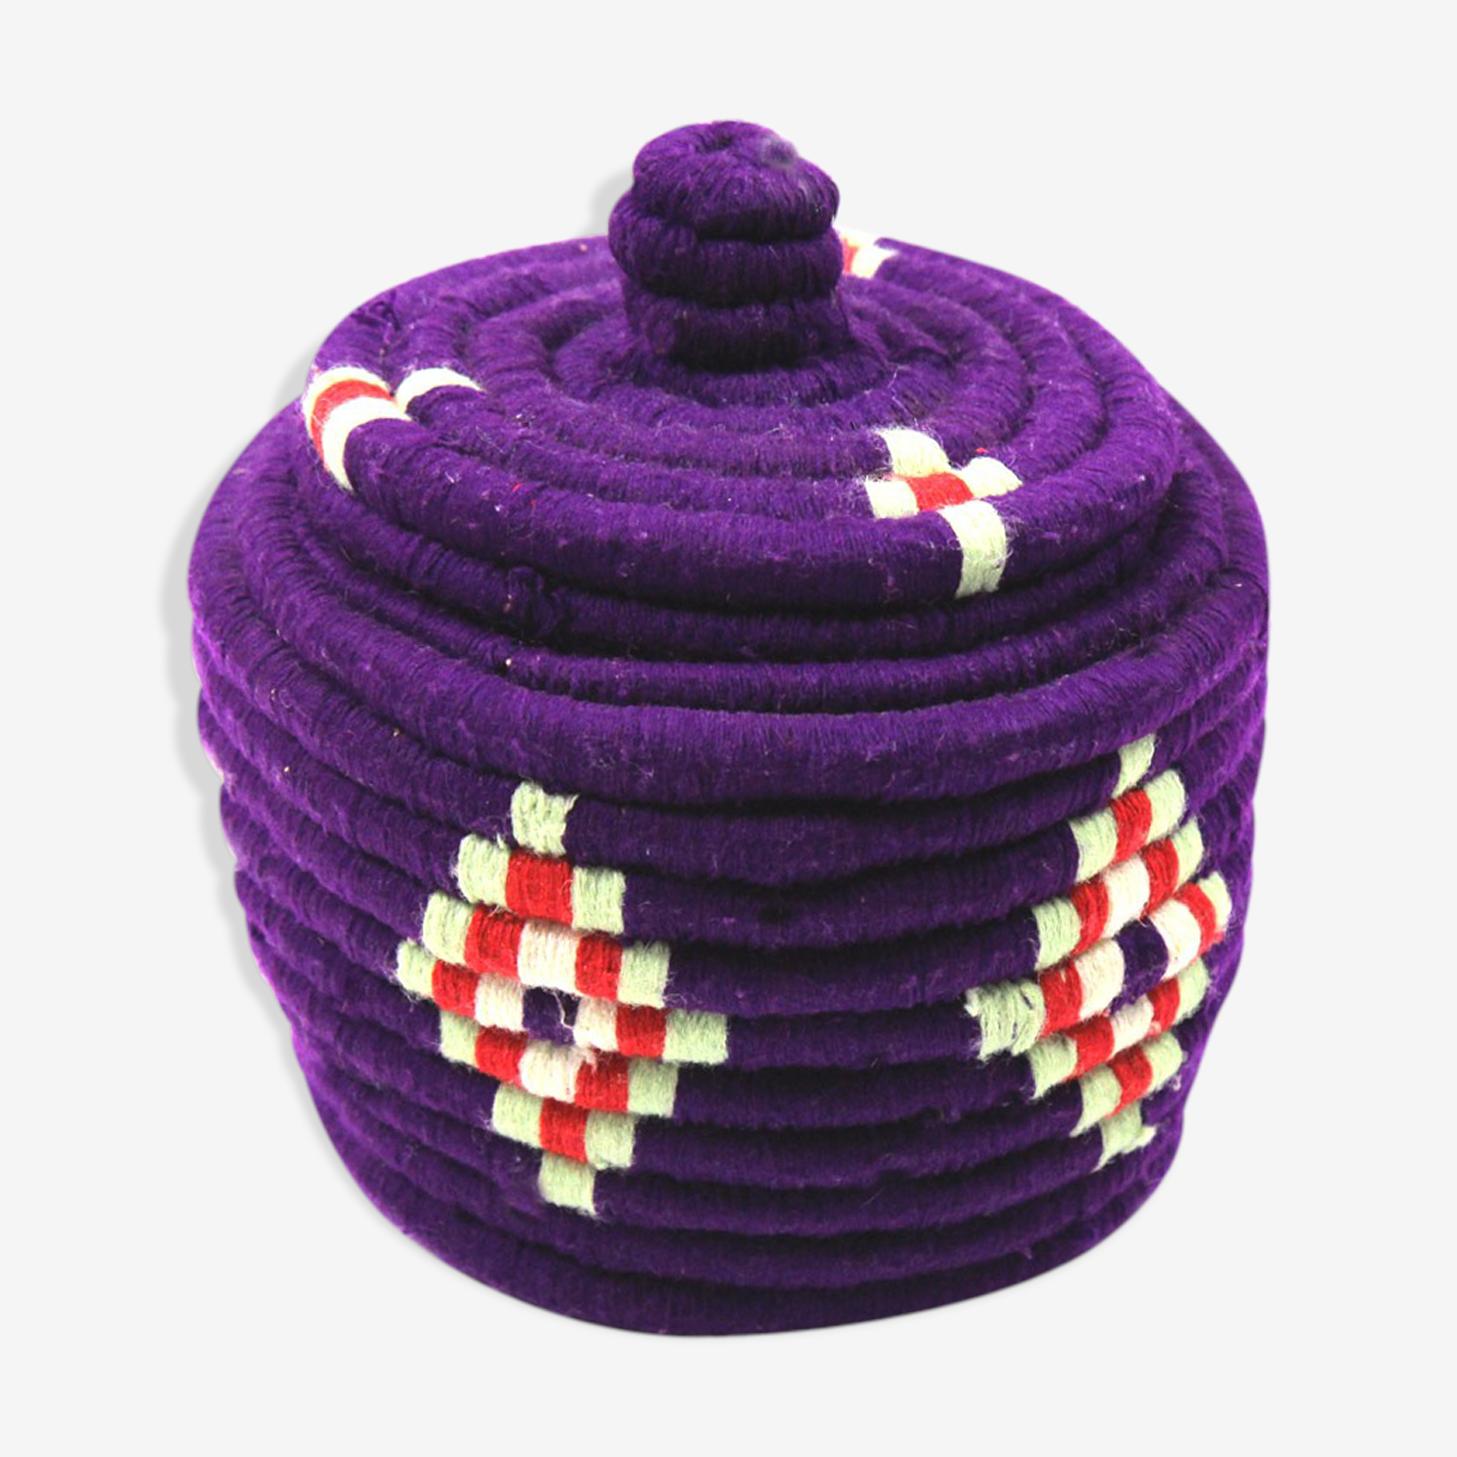 Boîte berbère violette